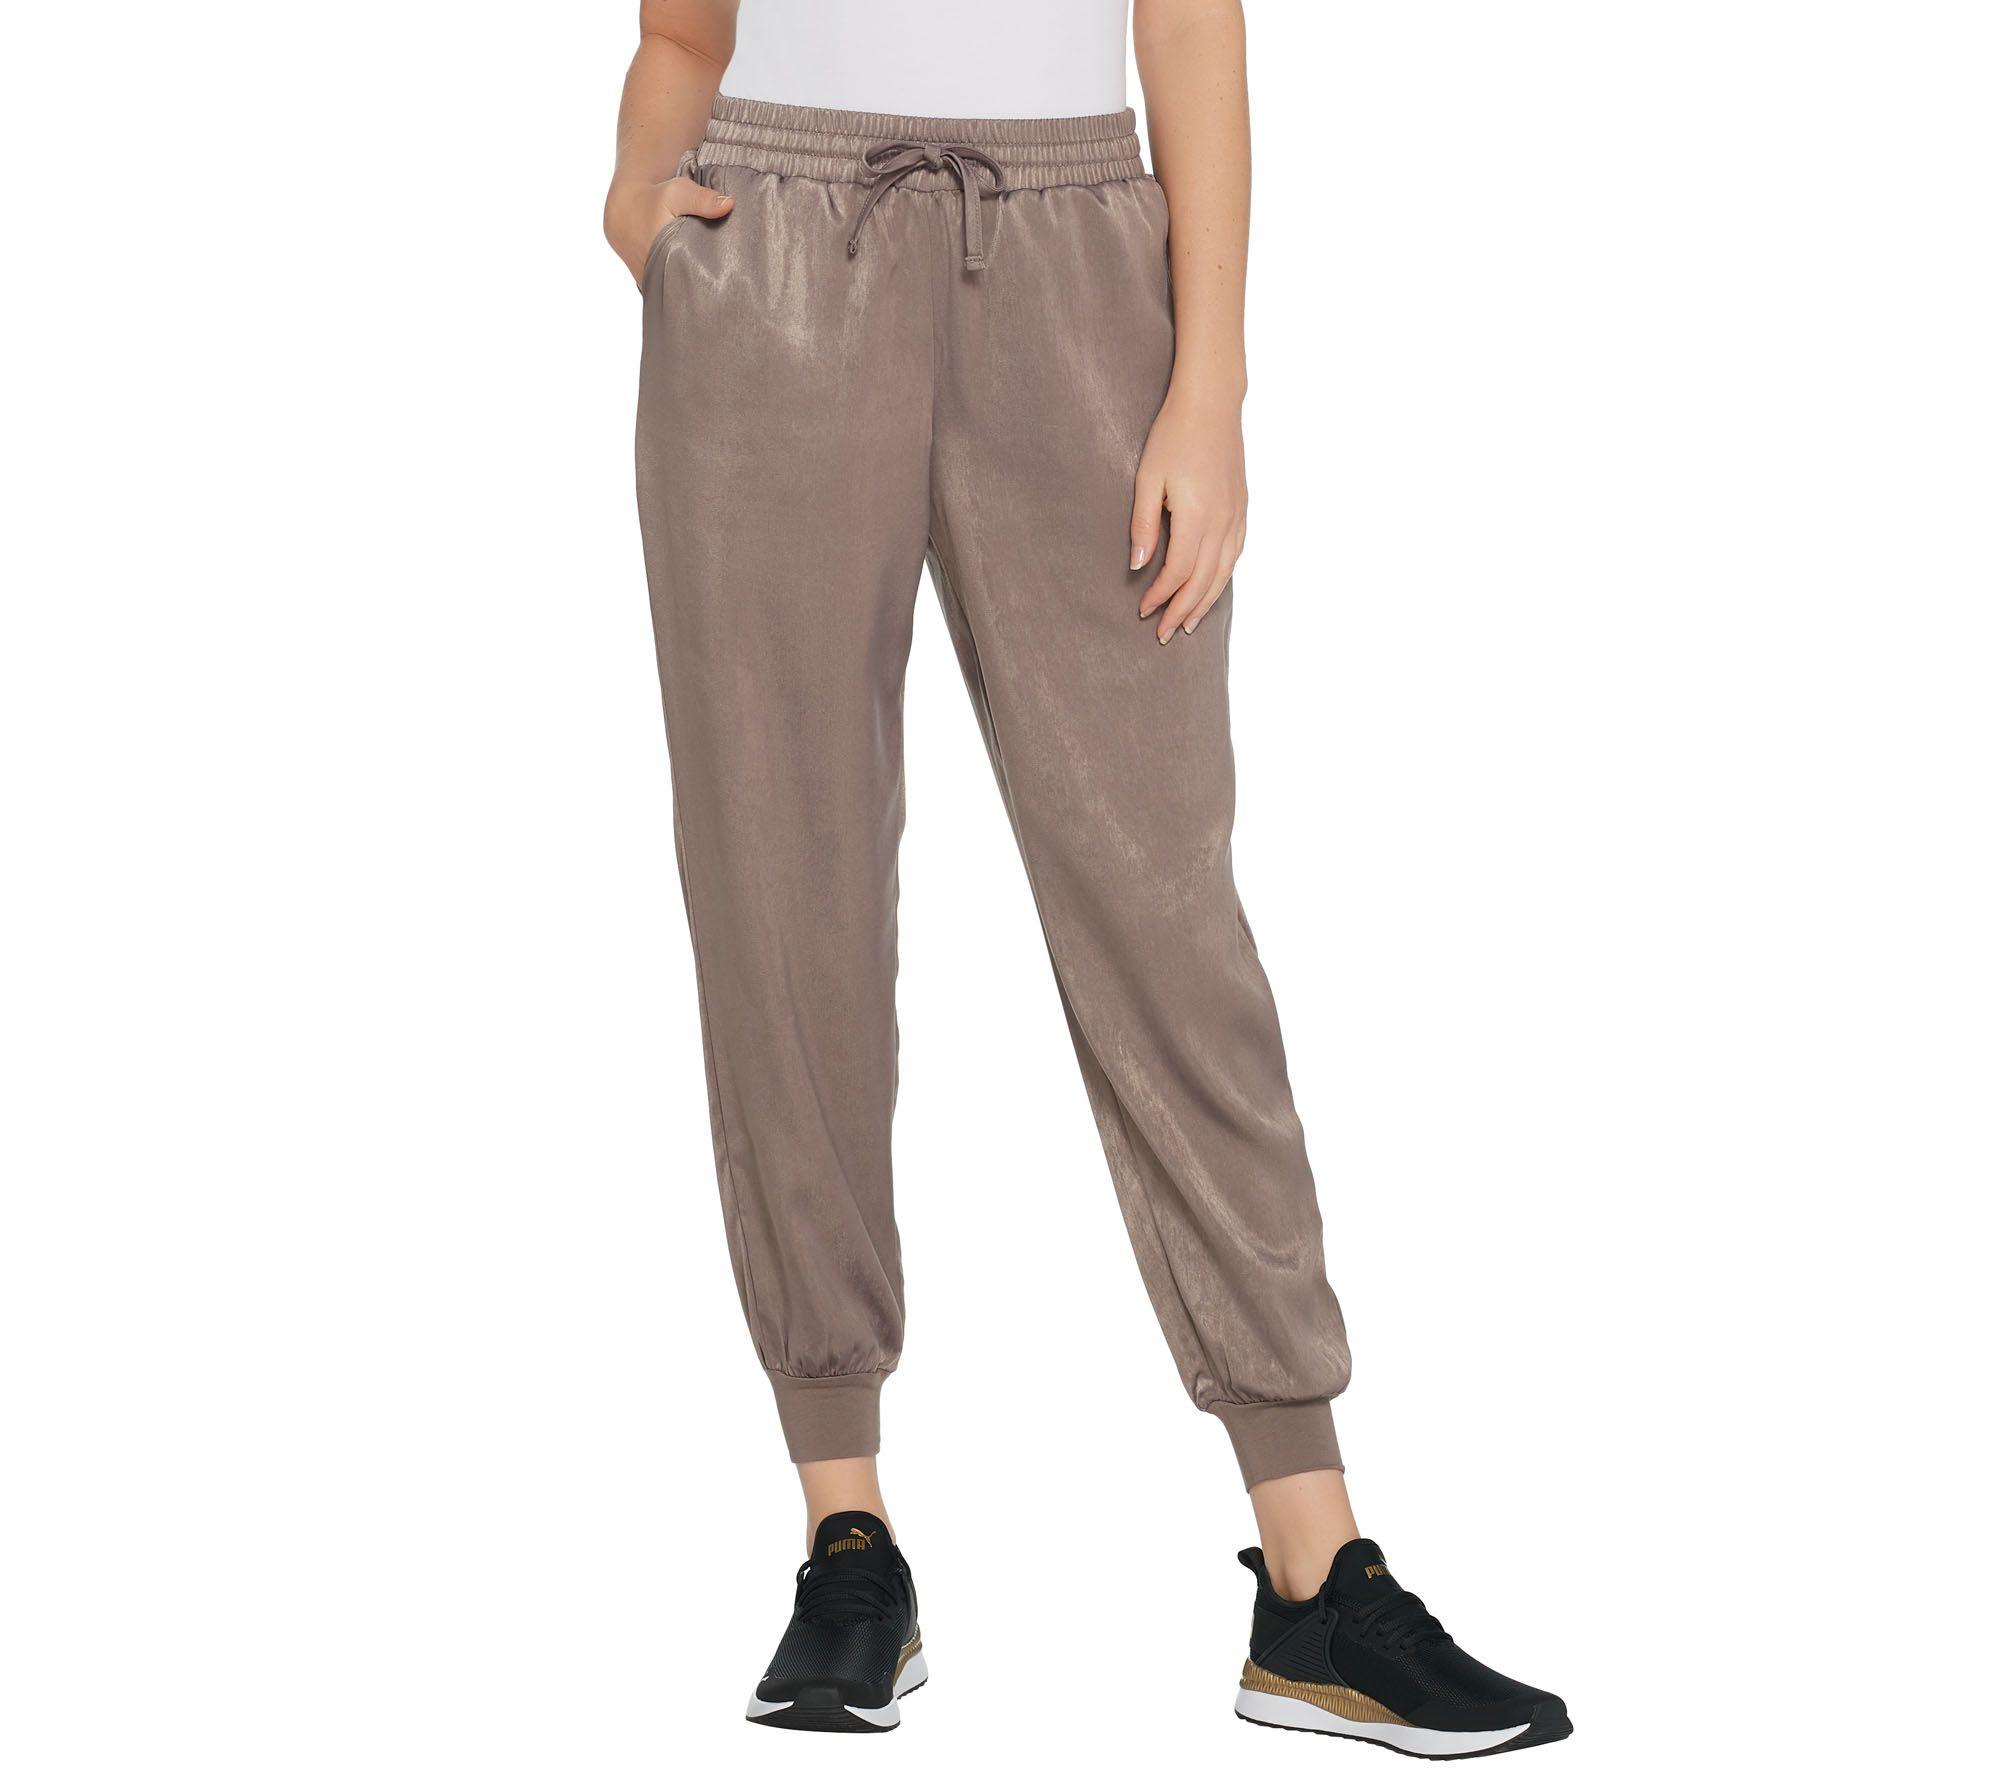 NEW CLOTH STONE WOMEN SzM  DRAWSTRING JOGGER LEG PANT SMOKE BLACK